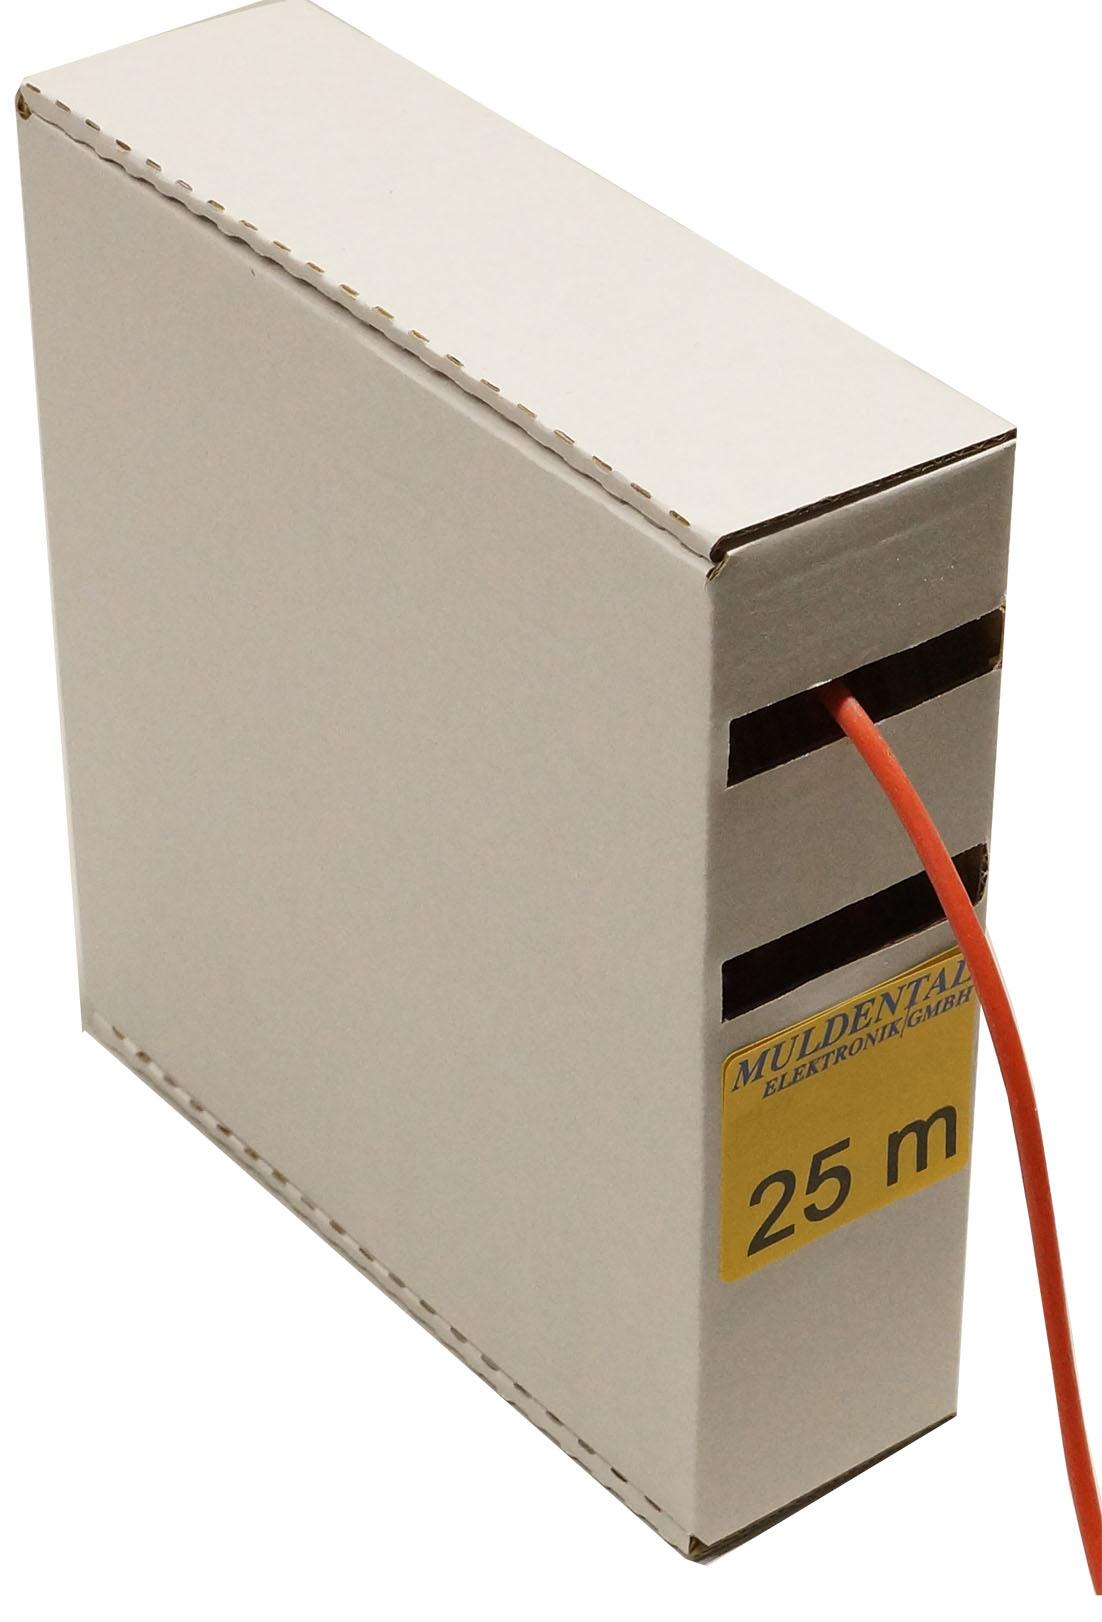 Litzen ein-/zweiadrig PVC, Sil., PTFE|Silikonlitze, verpackt1